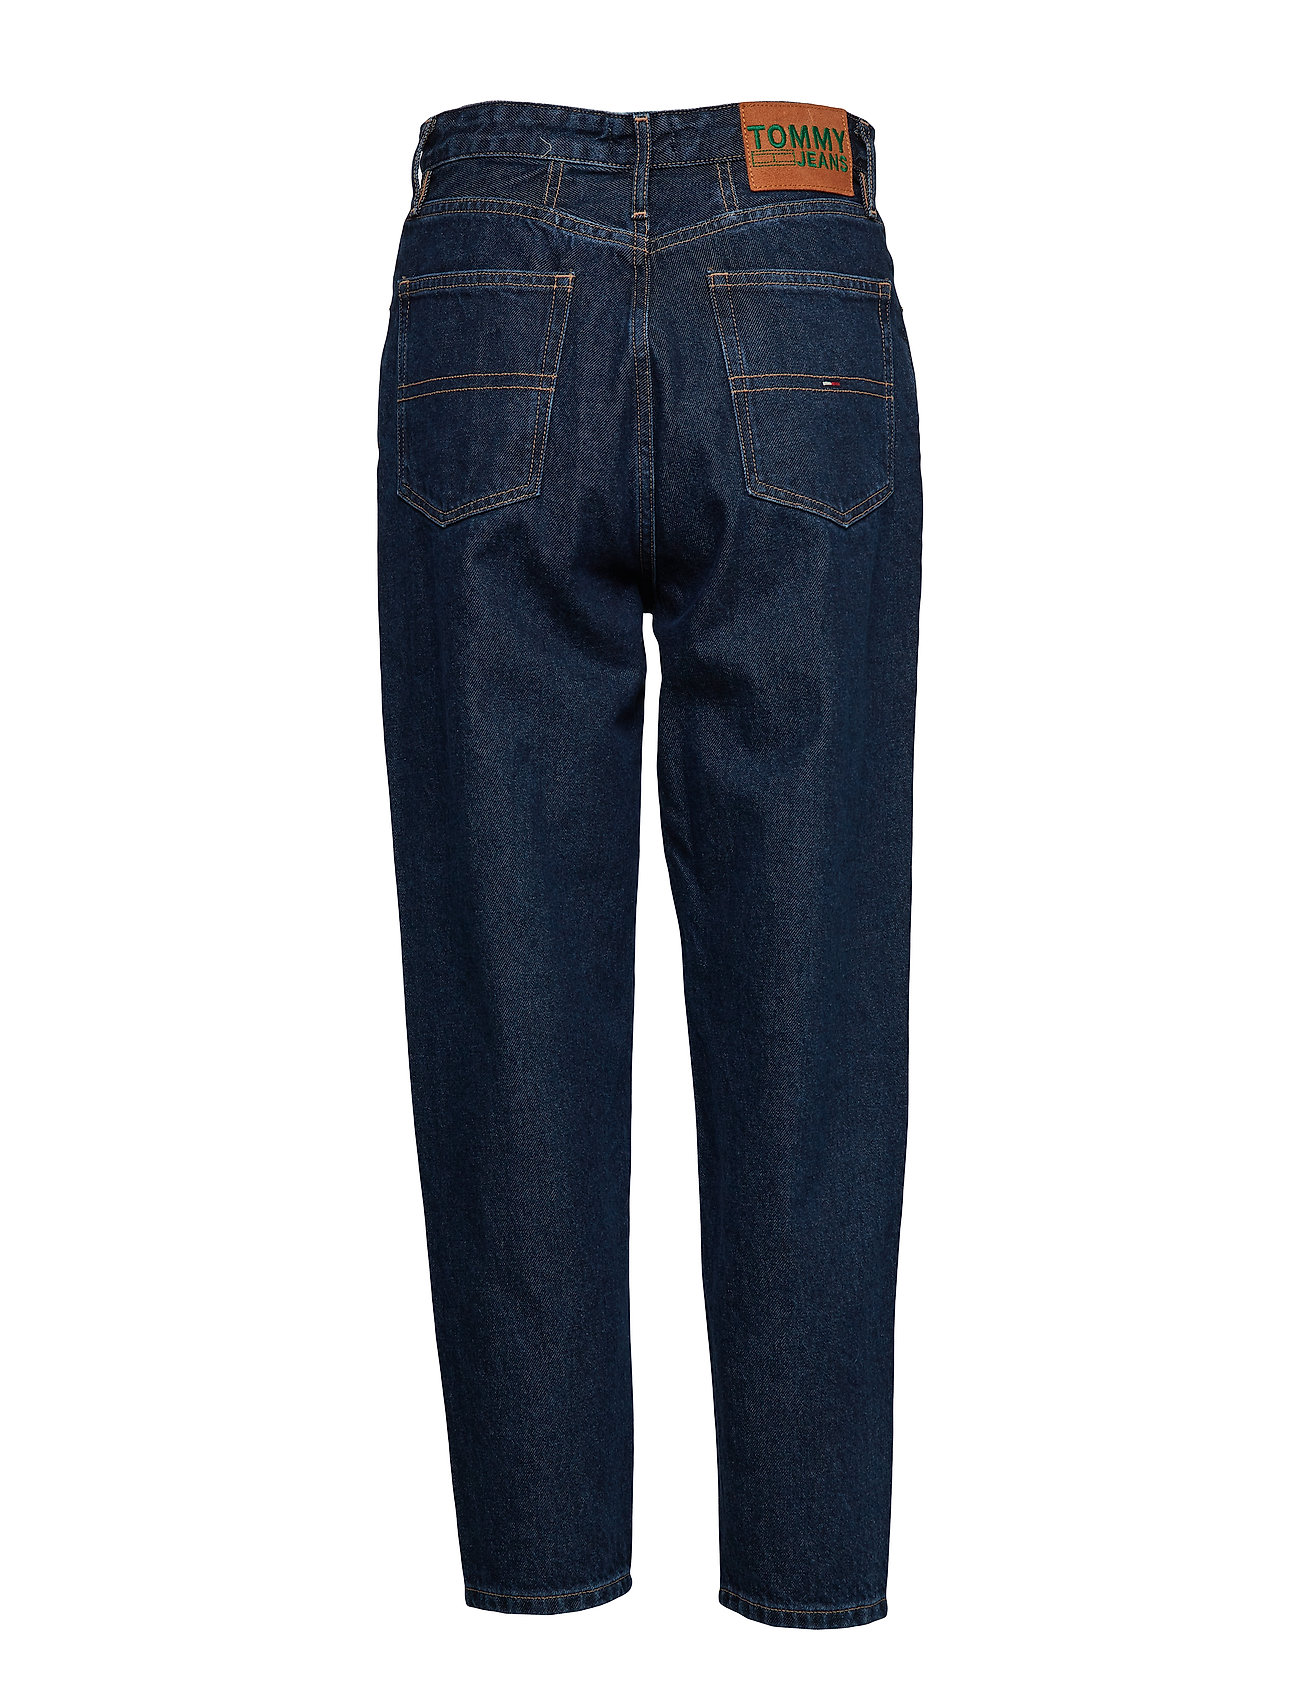 D High Jeans Bl Tj 2004 Tapered Save RgTommy Deep Tjsvddtj Rise tsxdCoQBhr